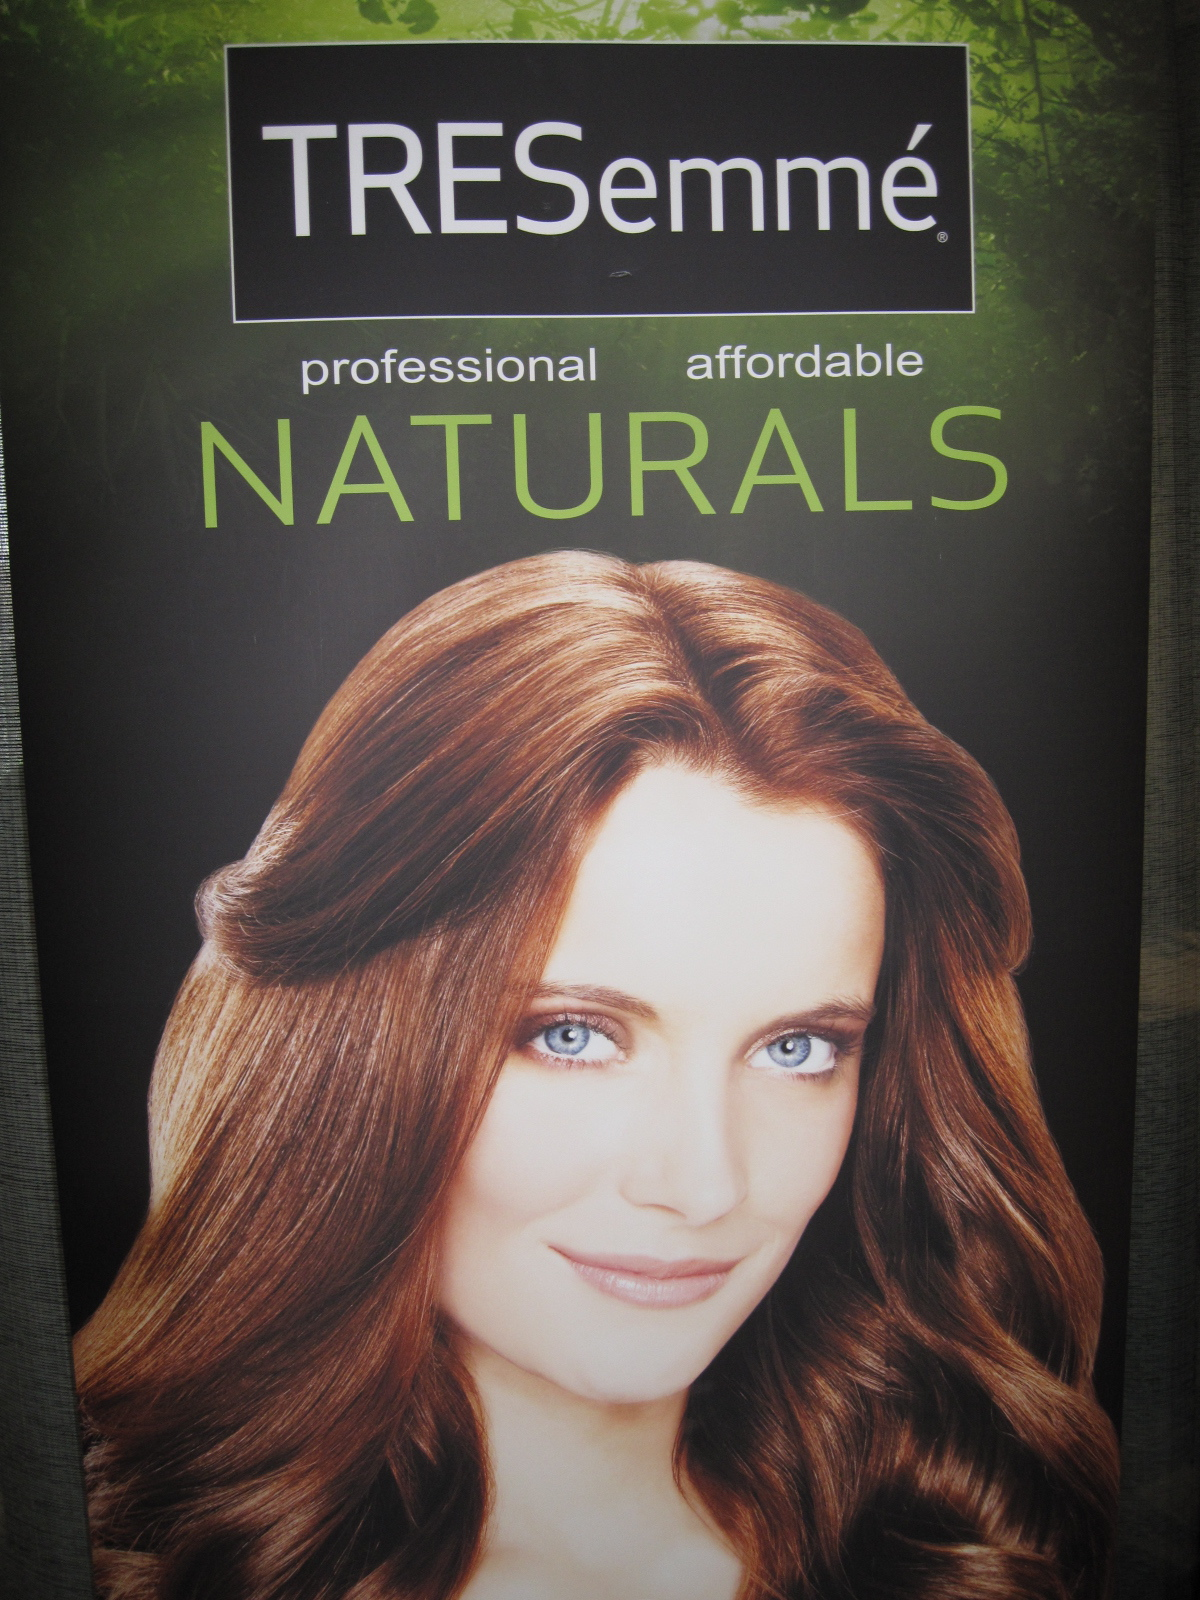 Tresemme Naturals Shampoo For Black Hair